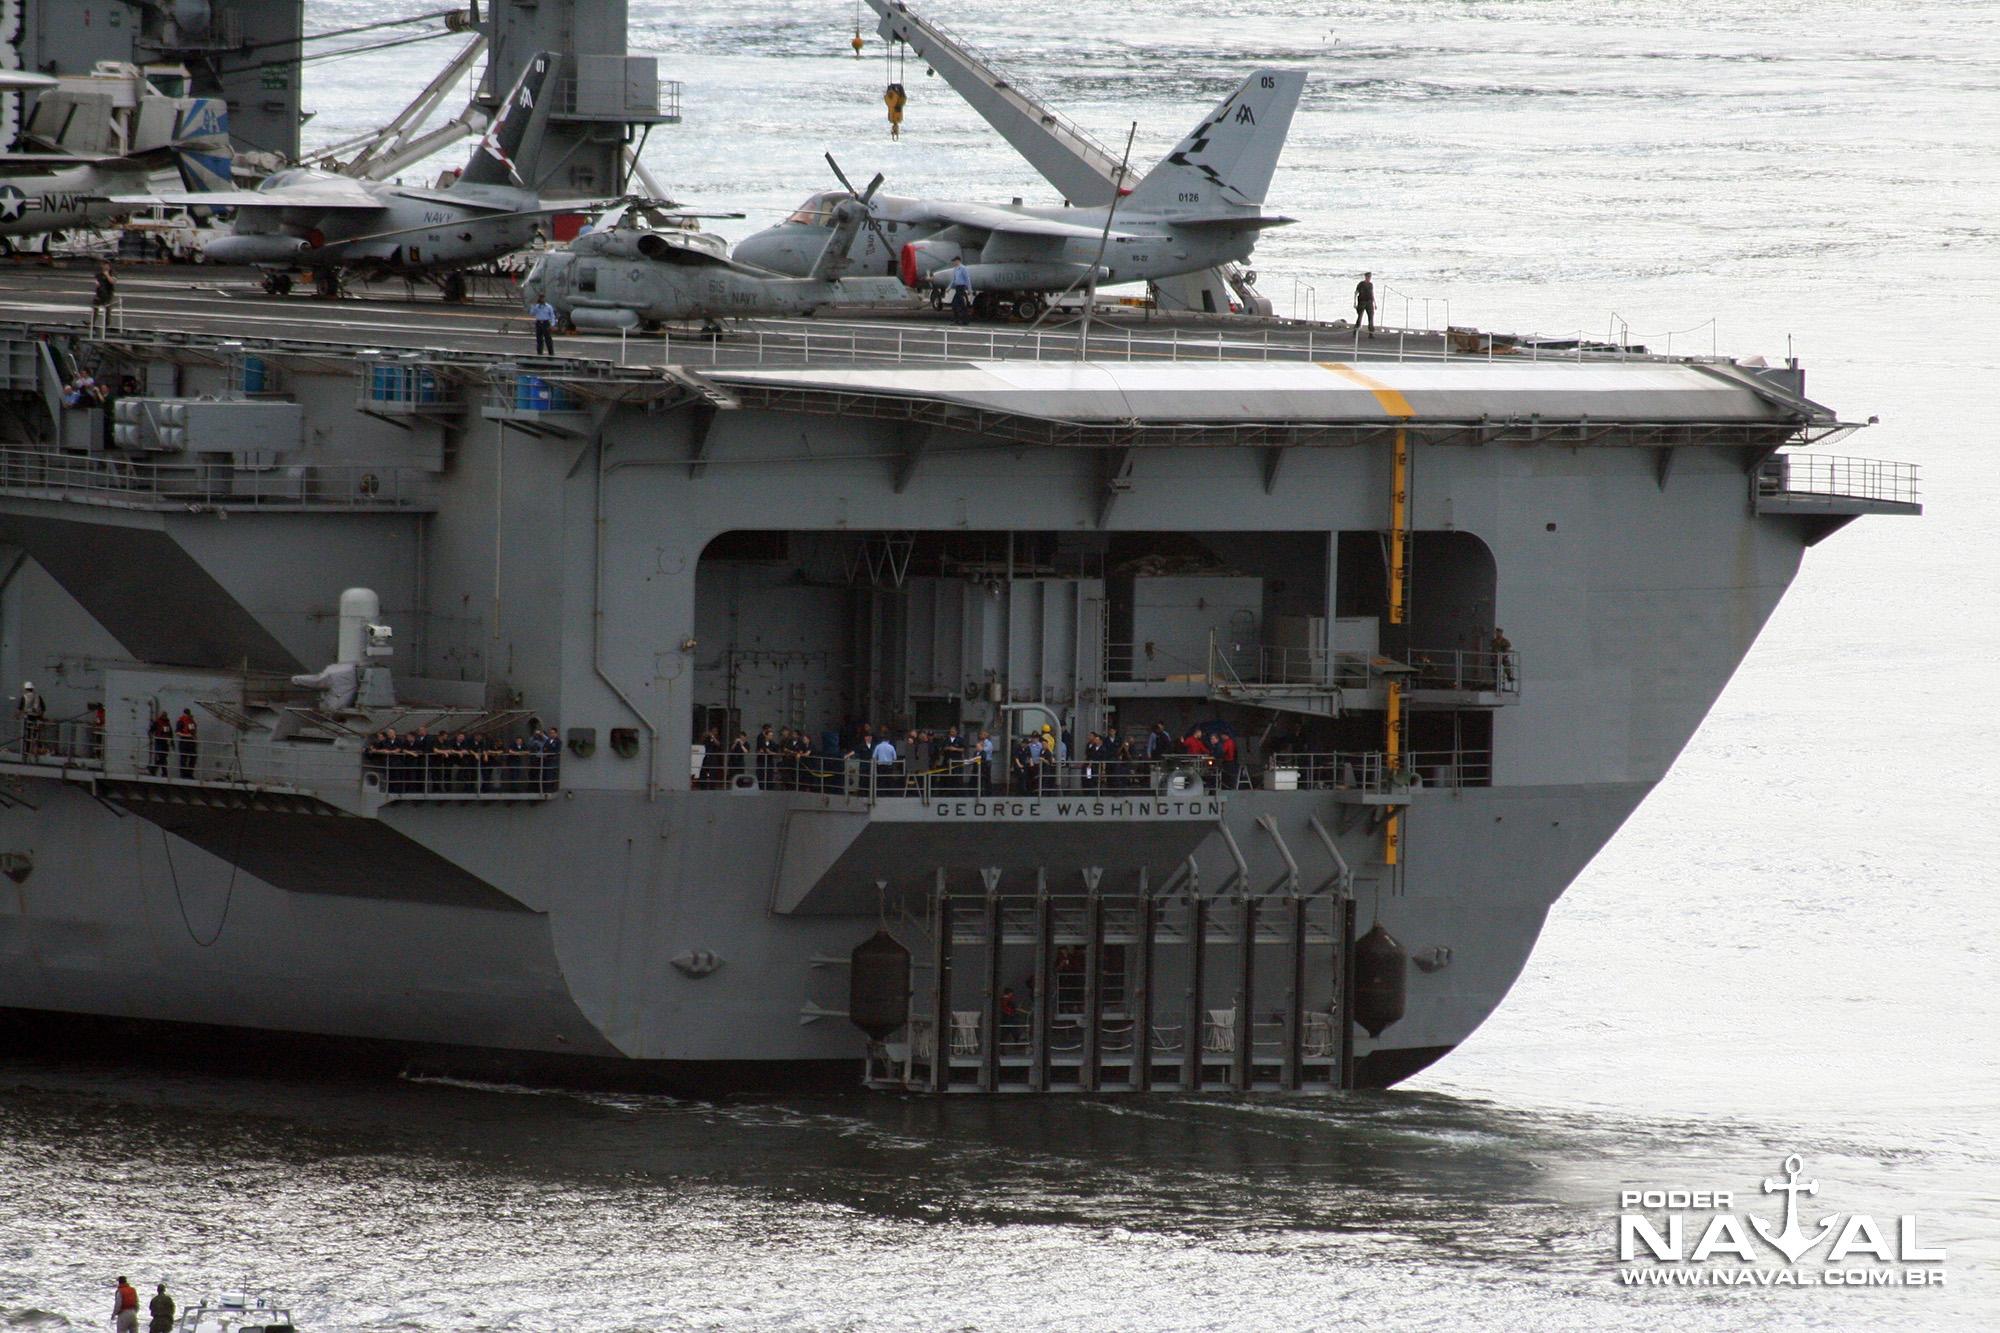 USS George Washington (CVN-73) no Rio - 2008 - 16